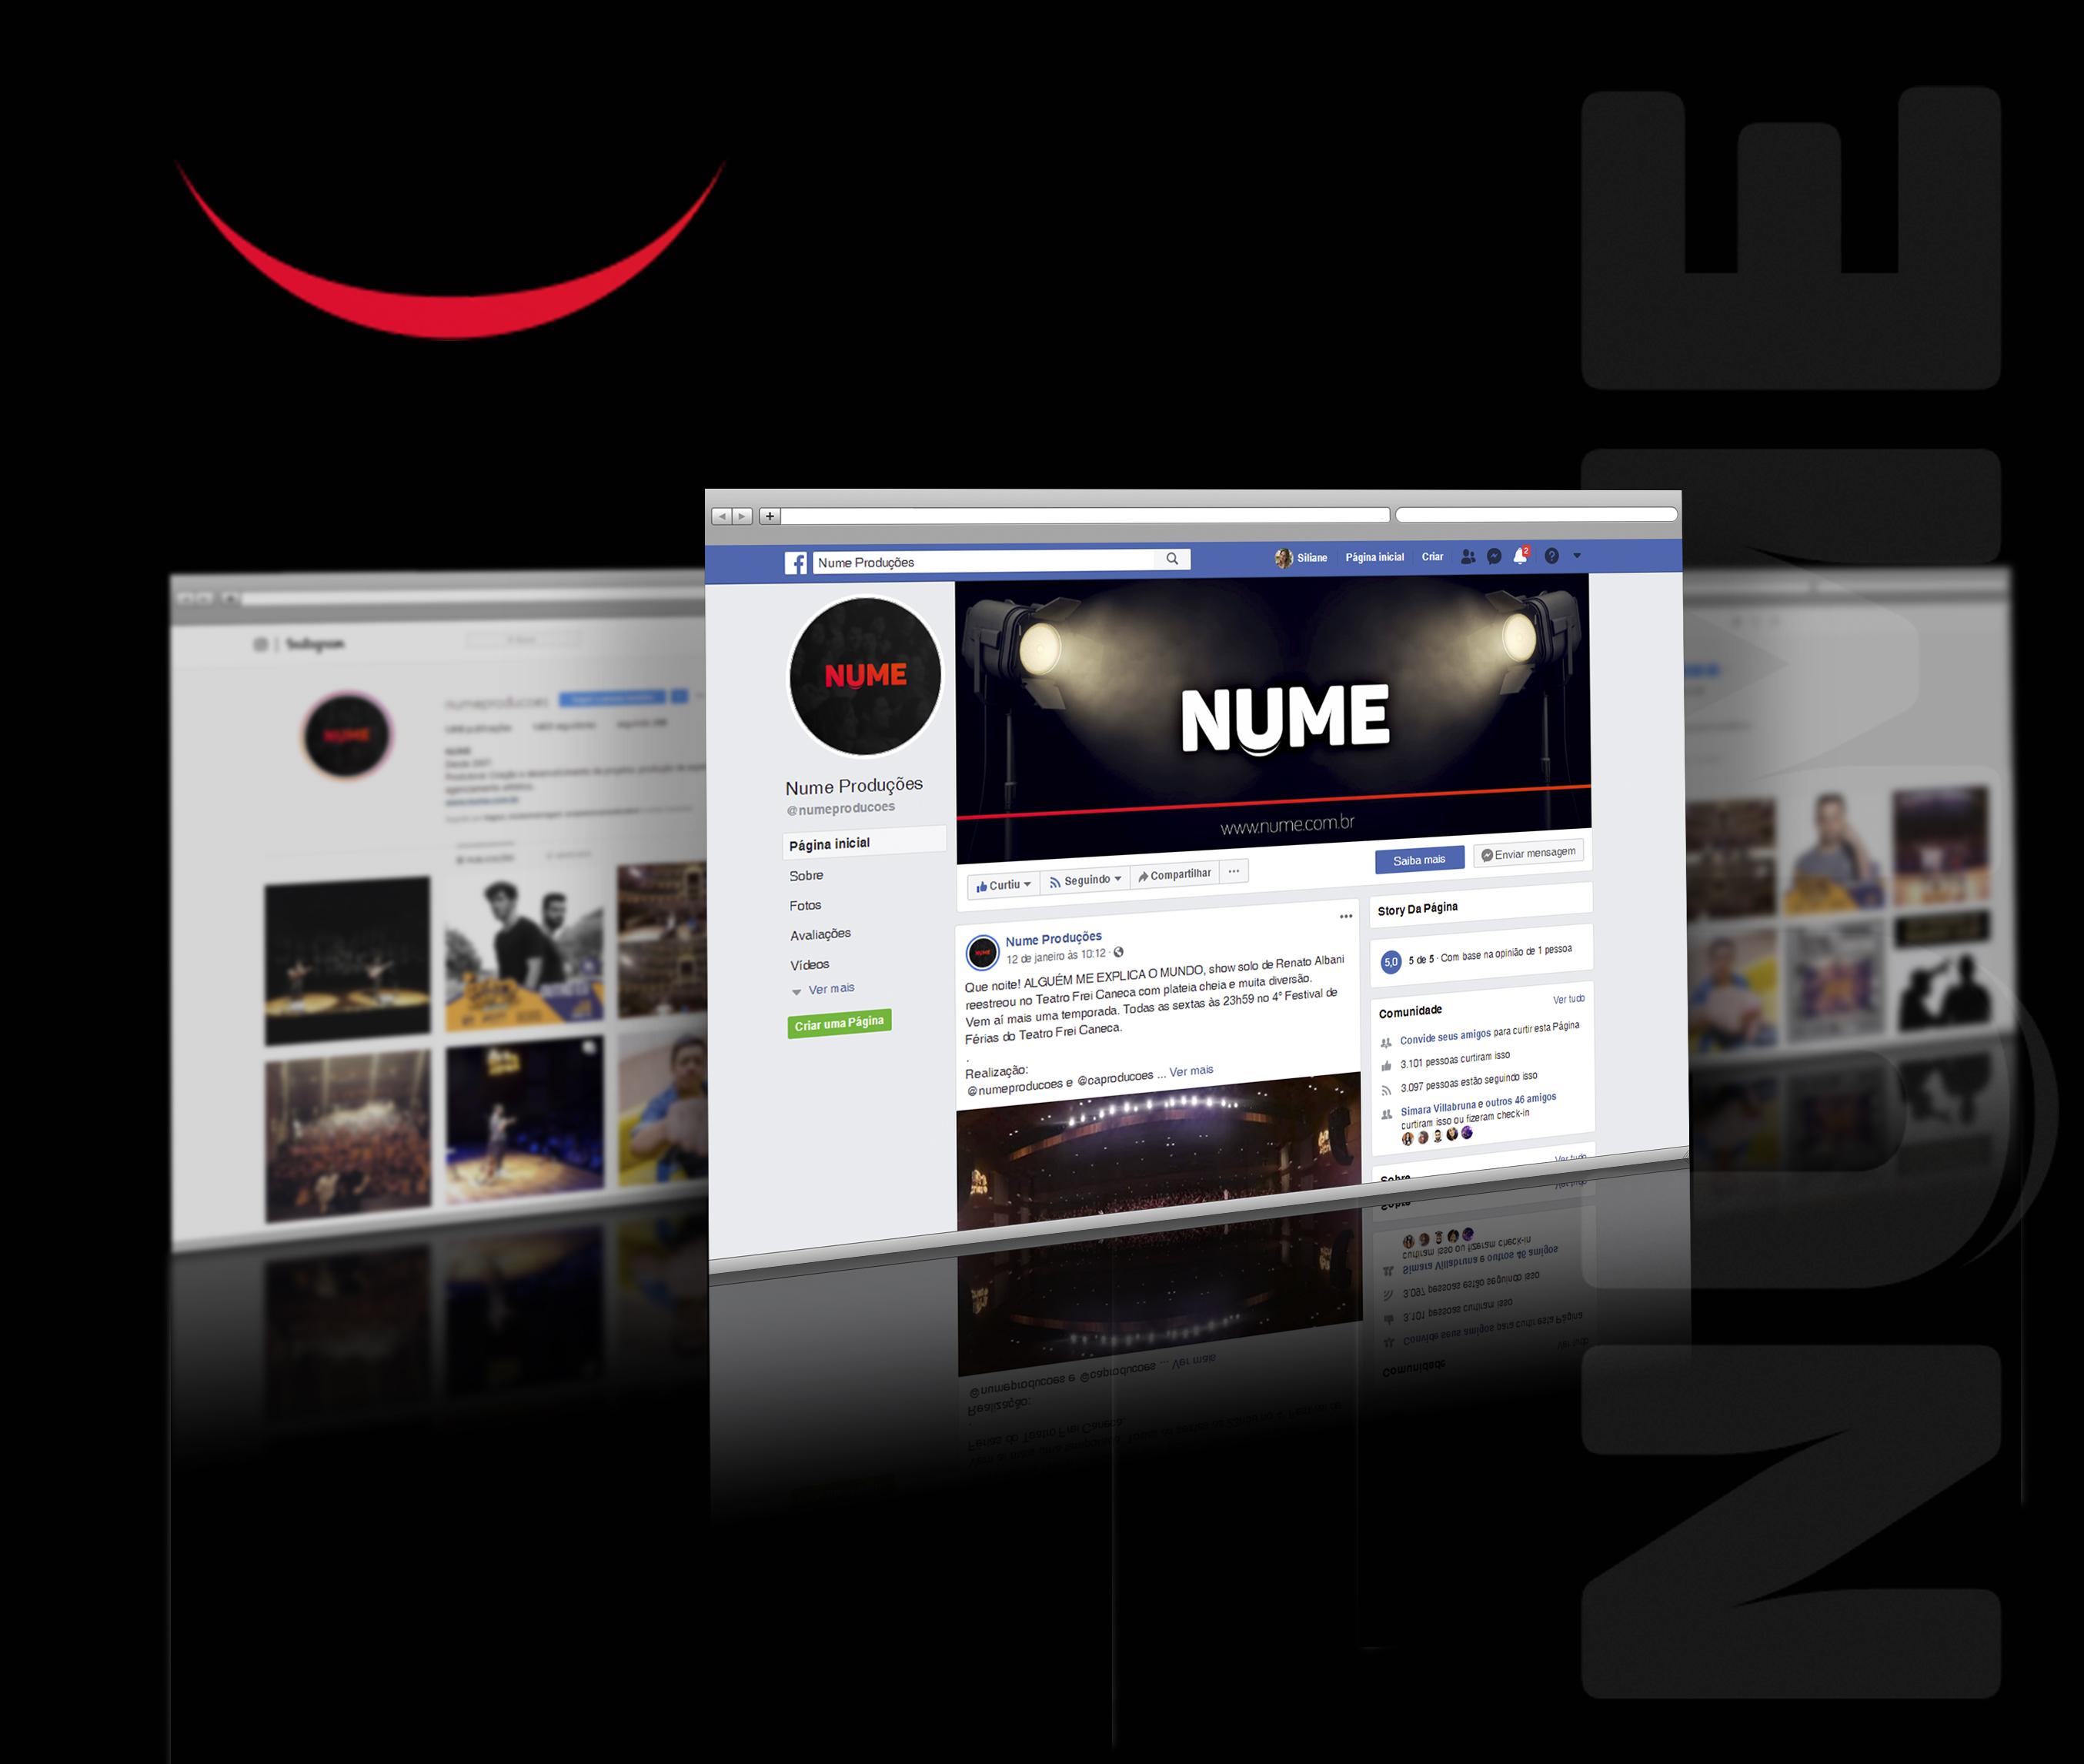 Nume4